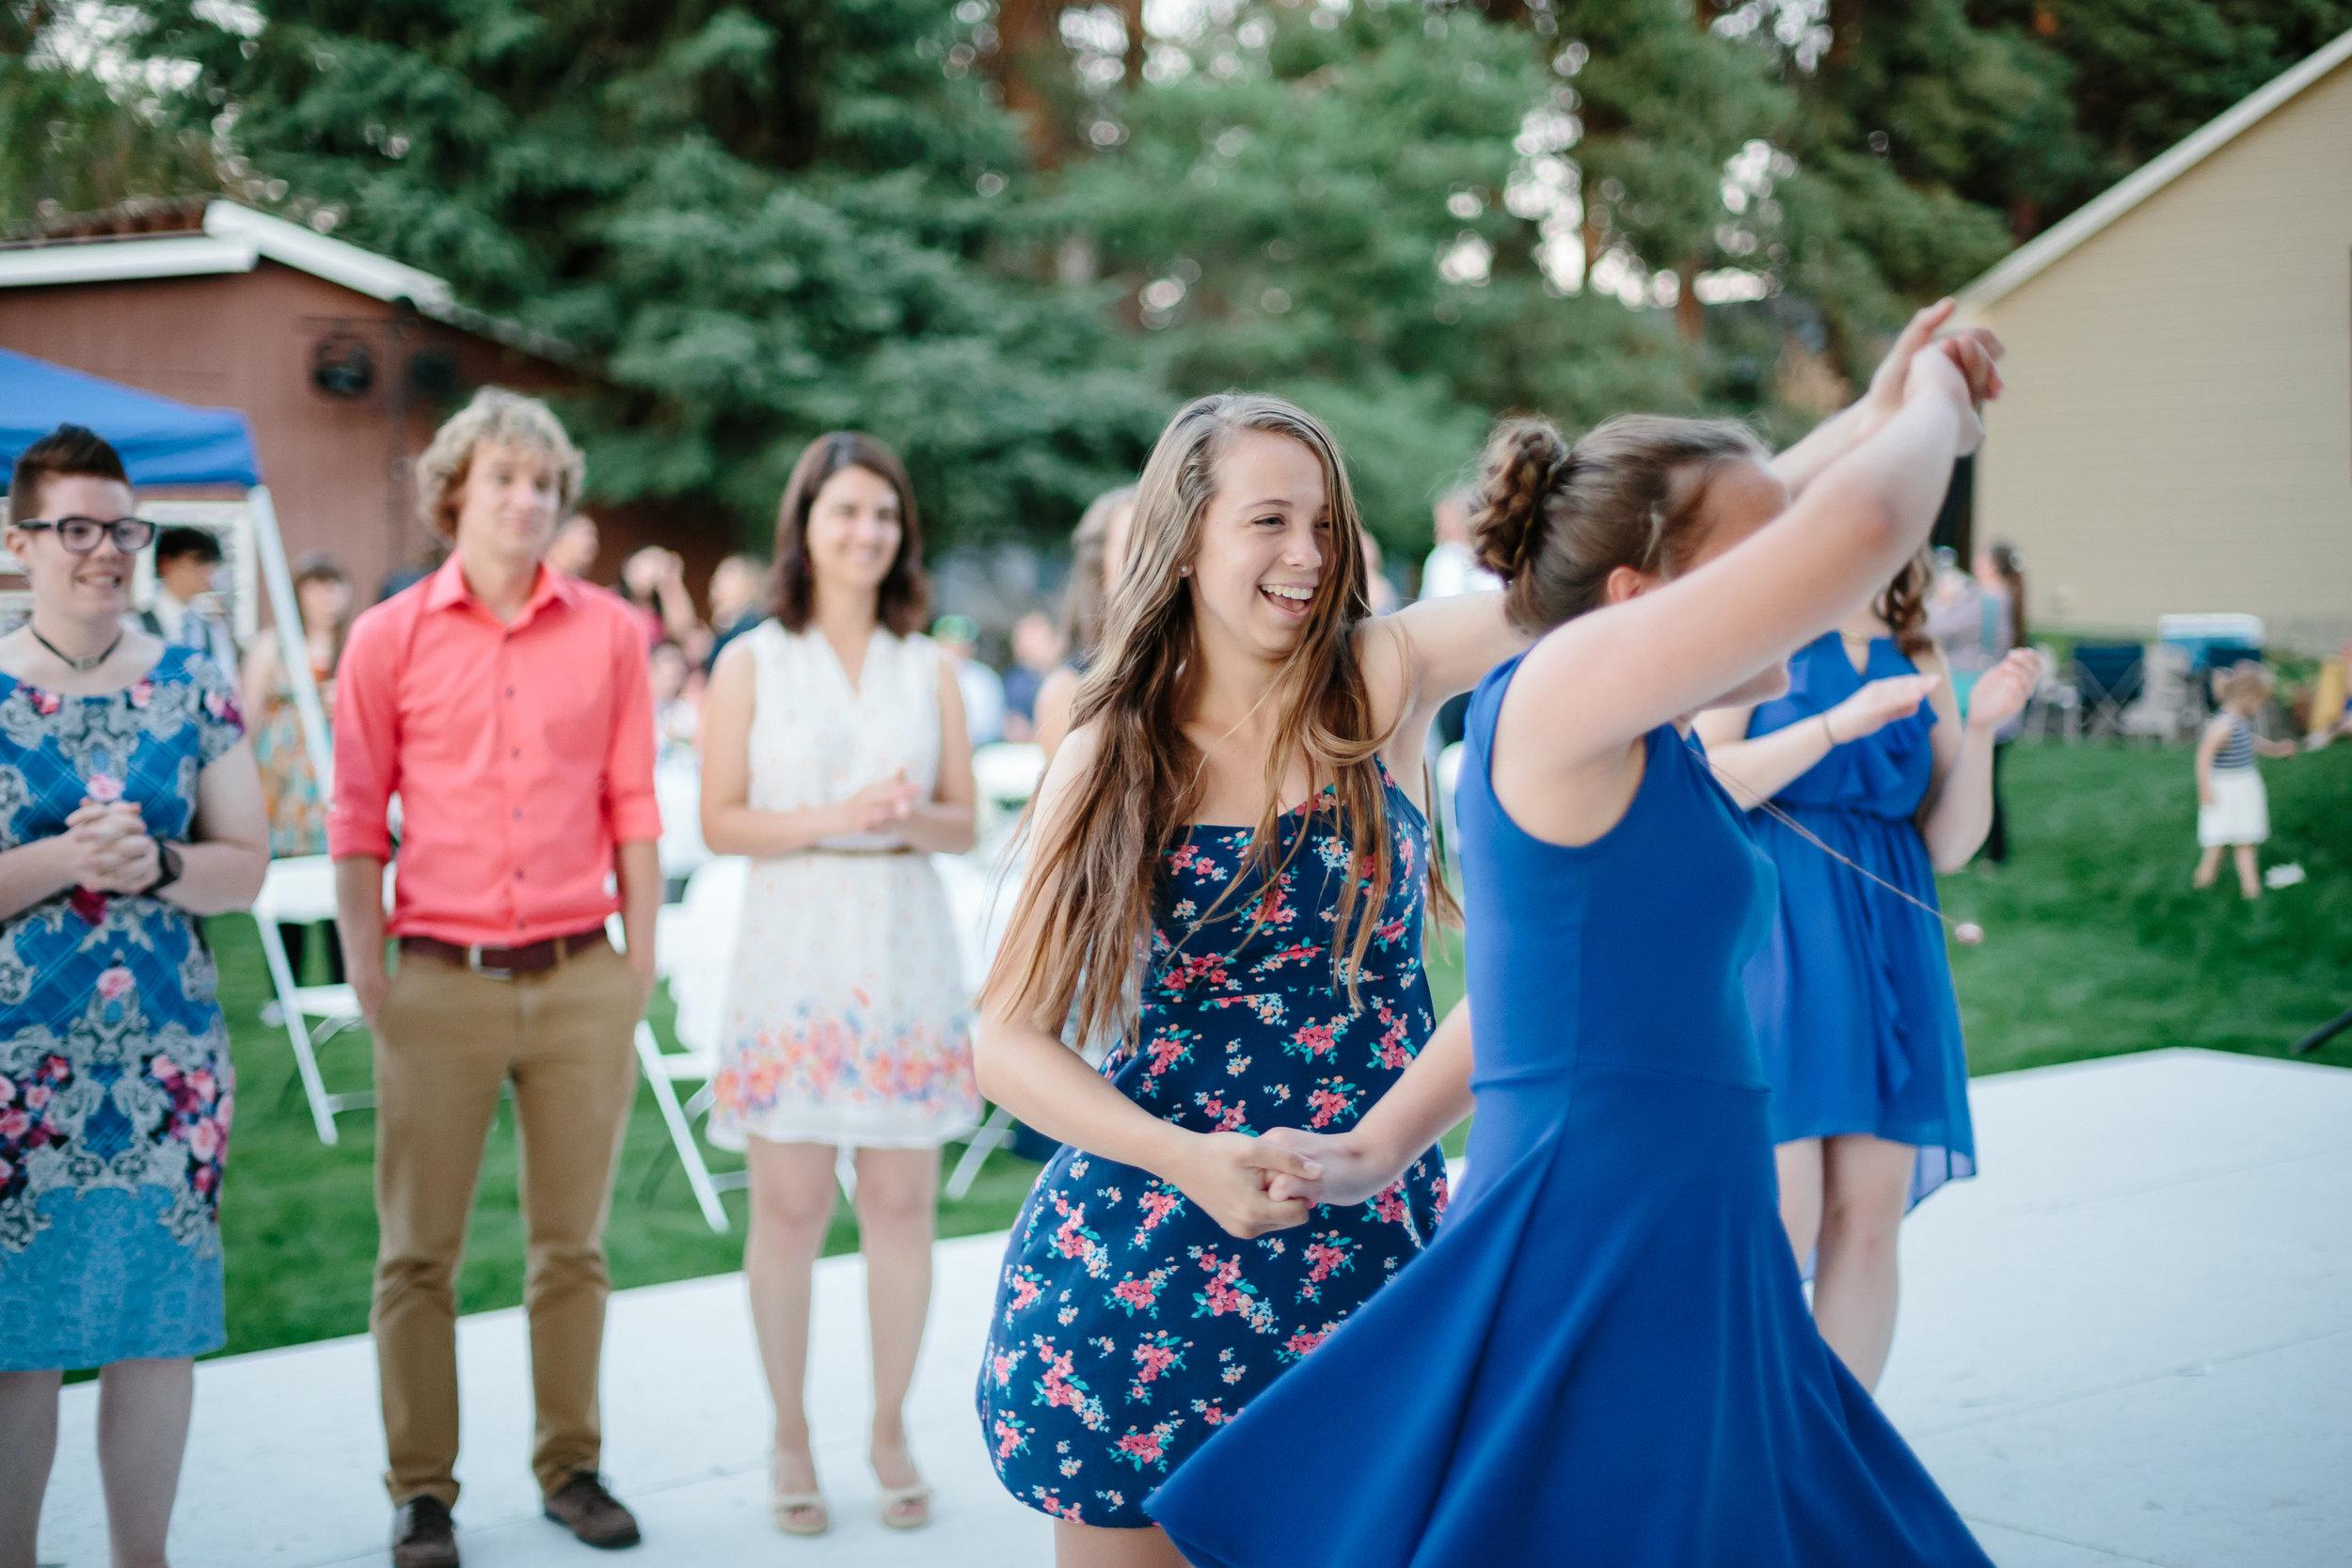 Jordan & Shantel Married - Idaho - Corrie Mick Photography-362.jpg